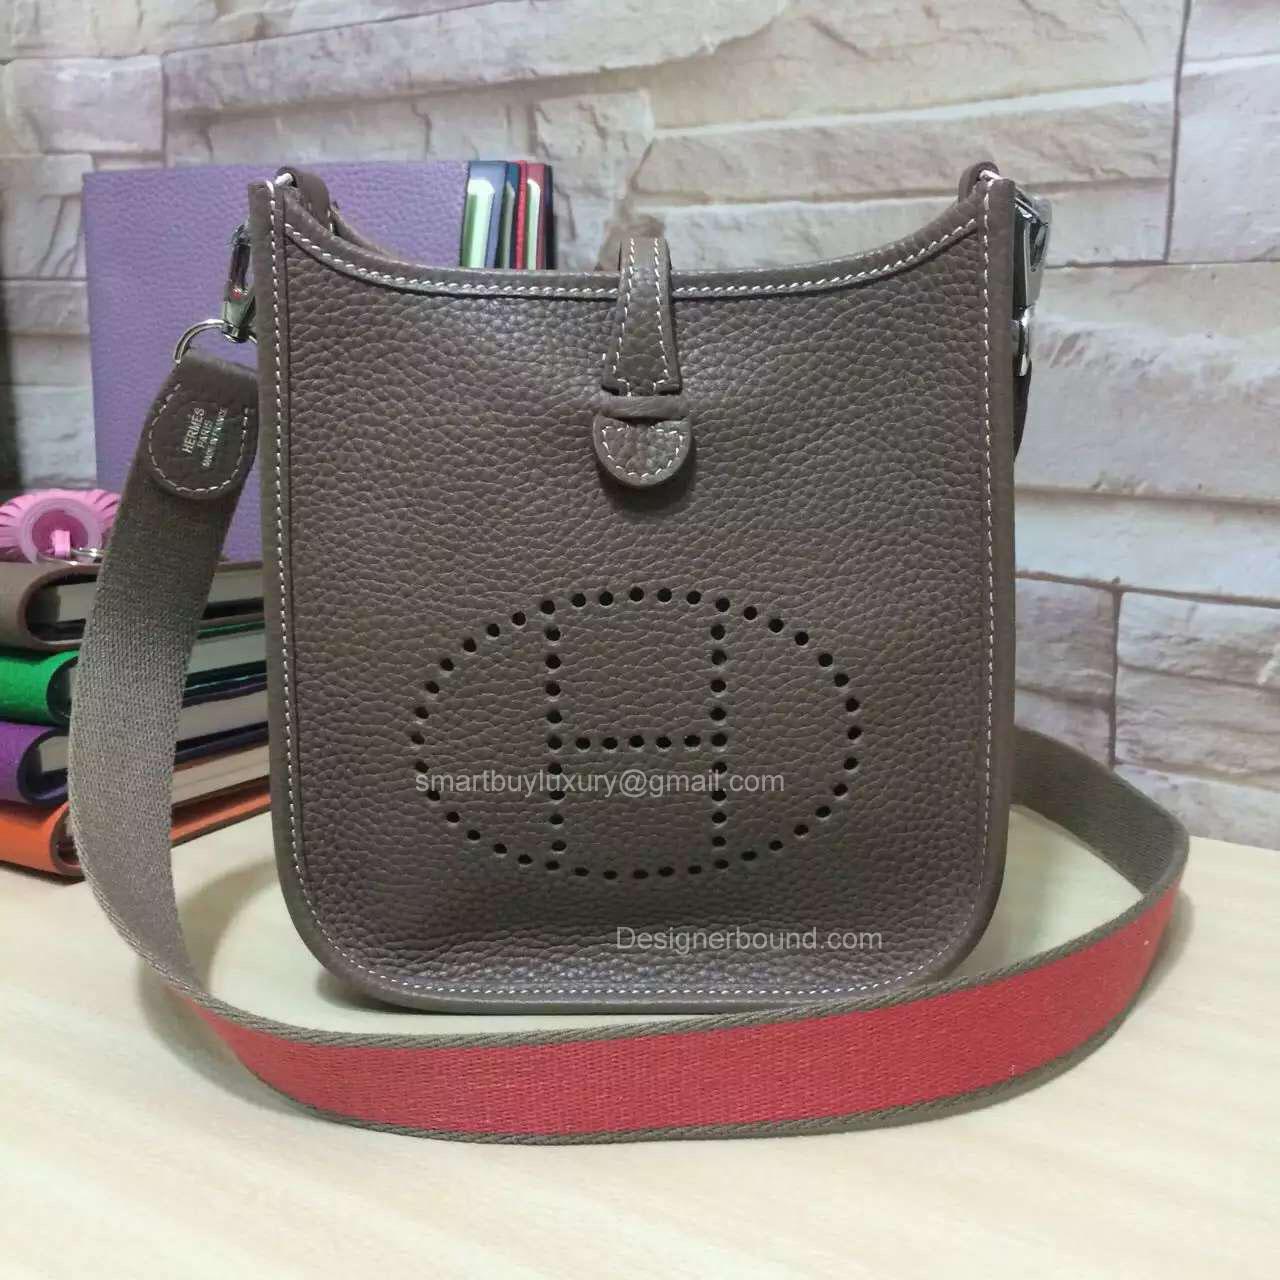 ... order hermes evelyne iii bag in etoupe togo leather tpm 2c814 e0046 ... f03ca99824